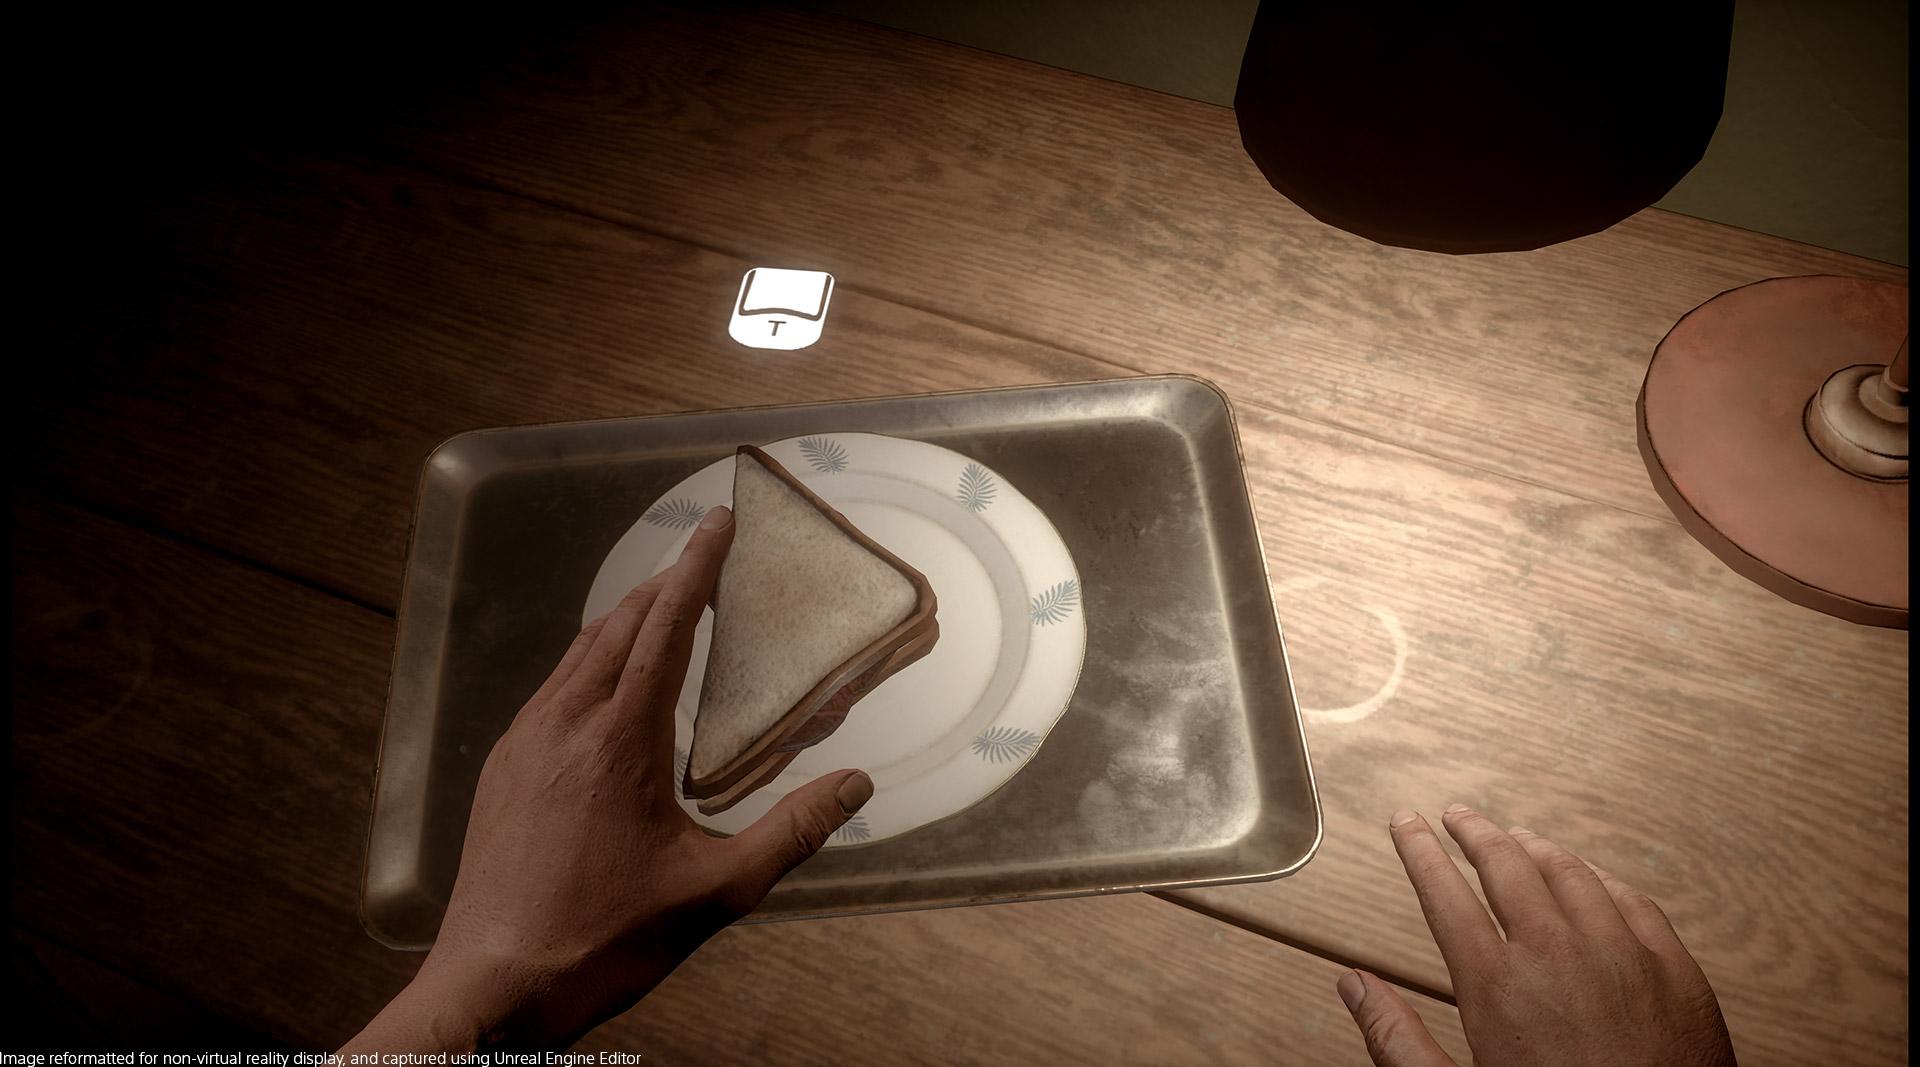 The Inpatient Move controller sandwich